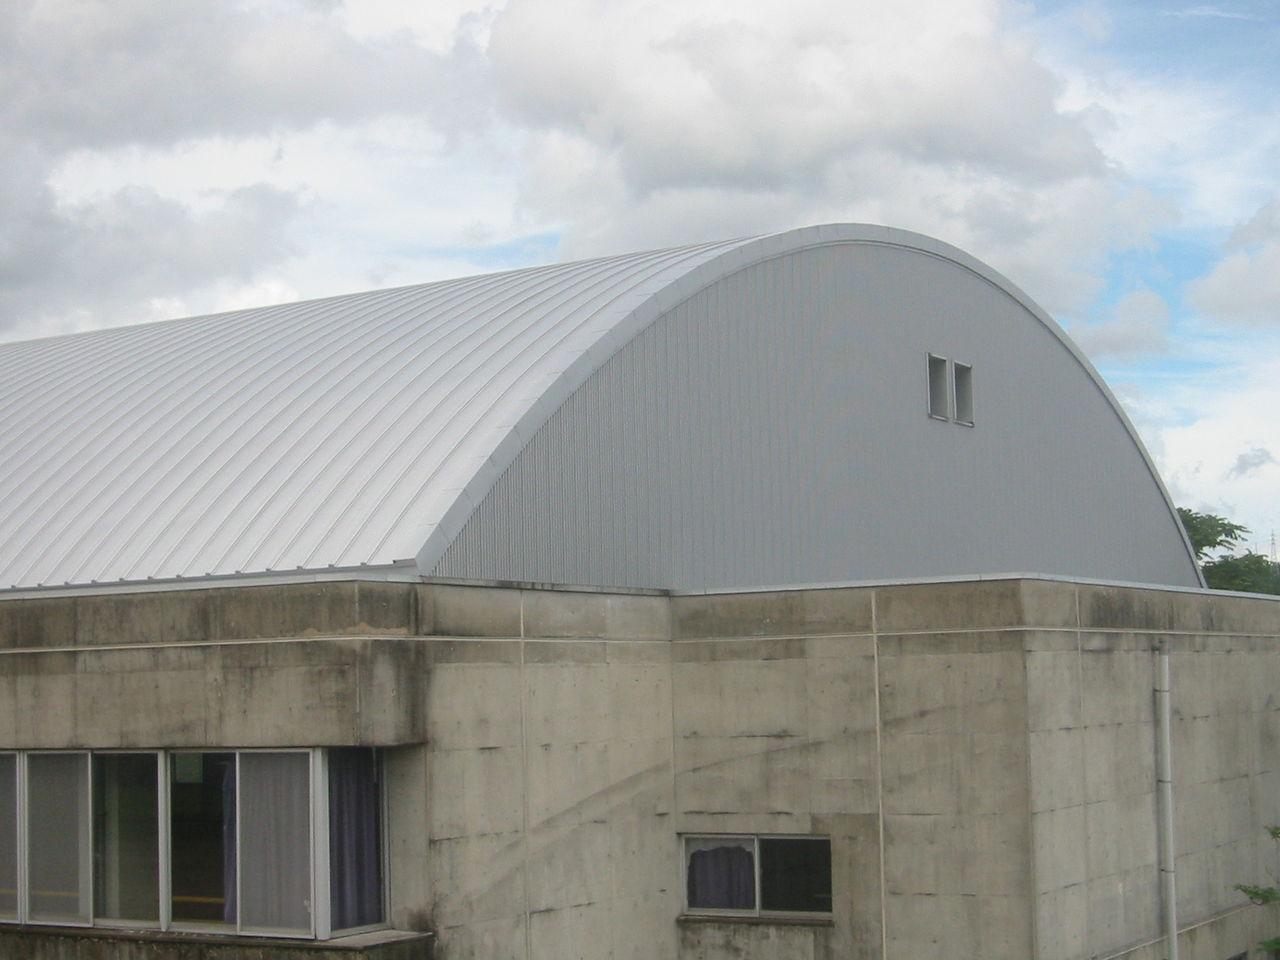 IMG_3898 (現場担当 立麻) カテゴリ:   玖珠町民体育館屋根改修工事